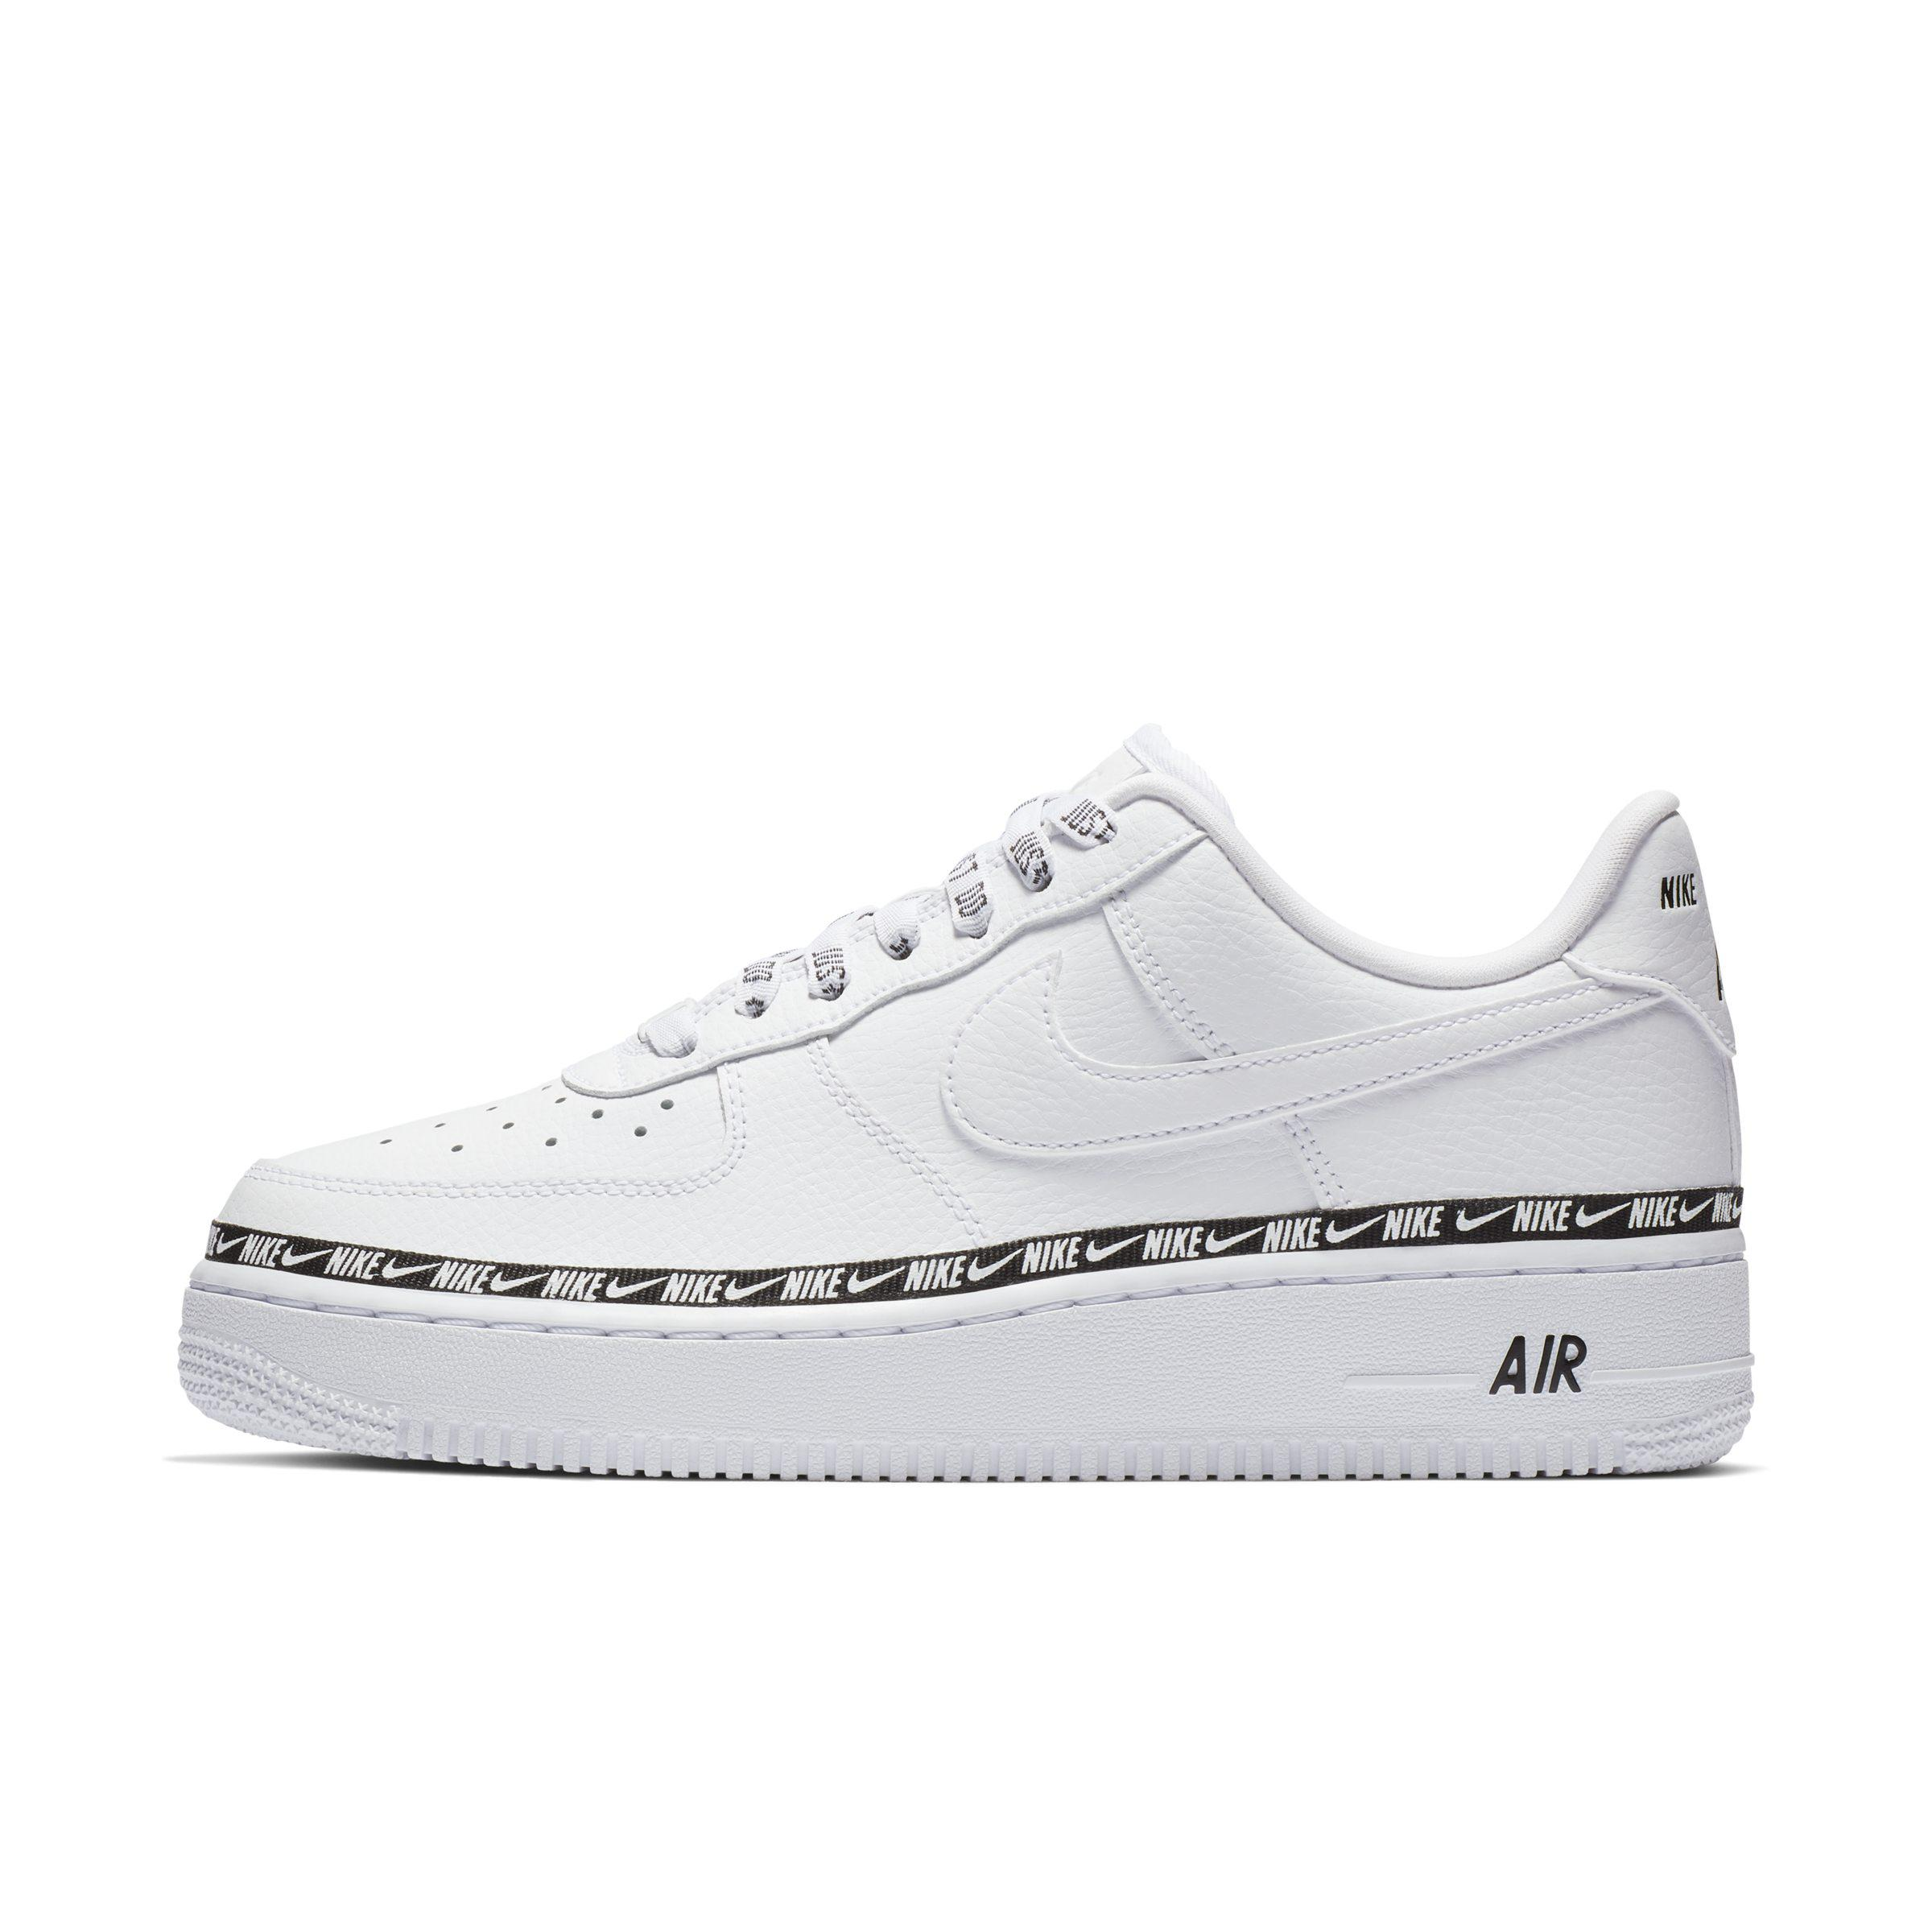 c688571de685 Nike Air Force 1  07 Se Premium Shoe in White - Lyst